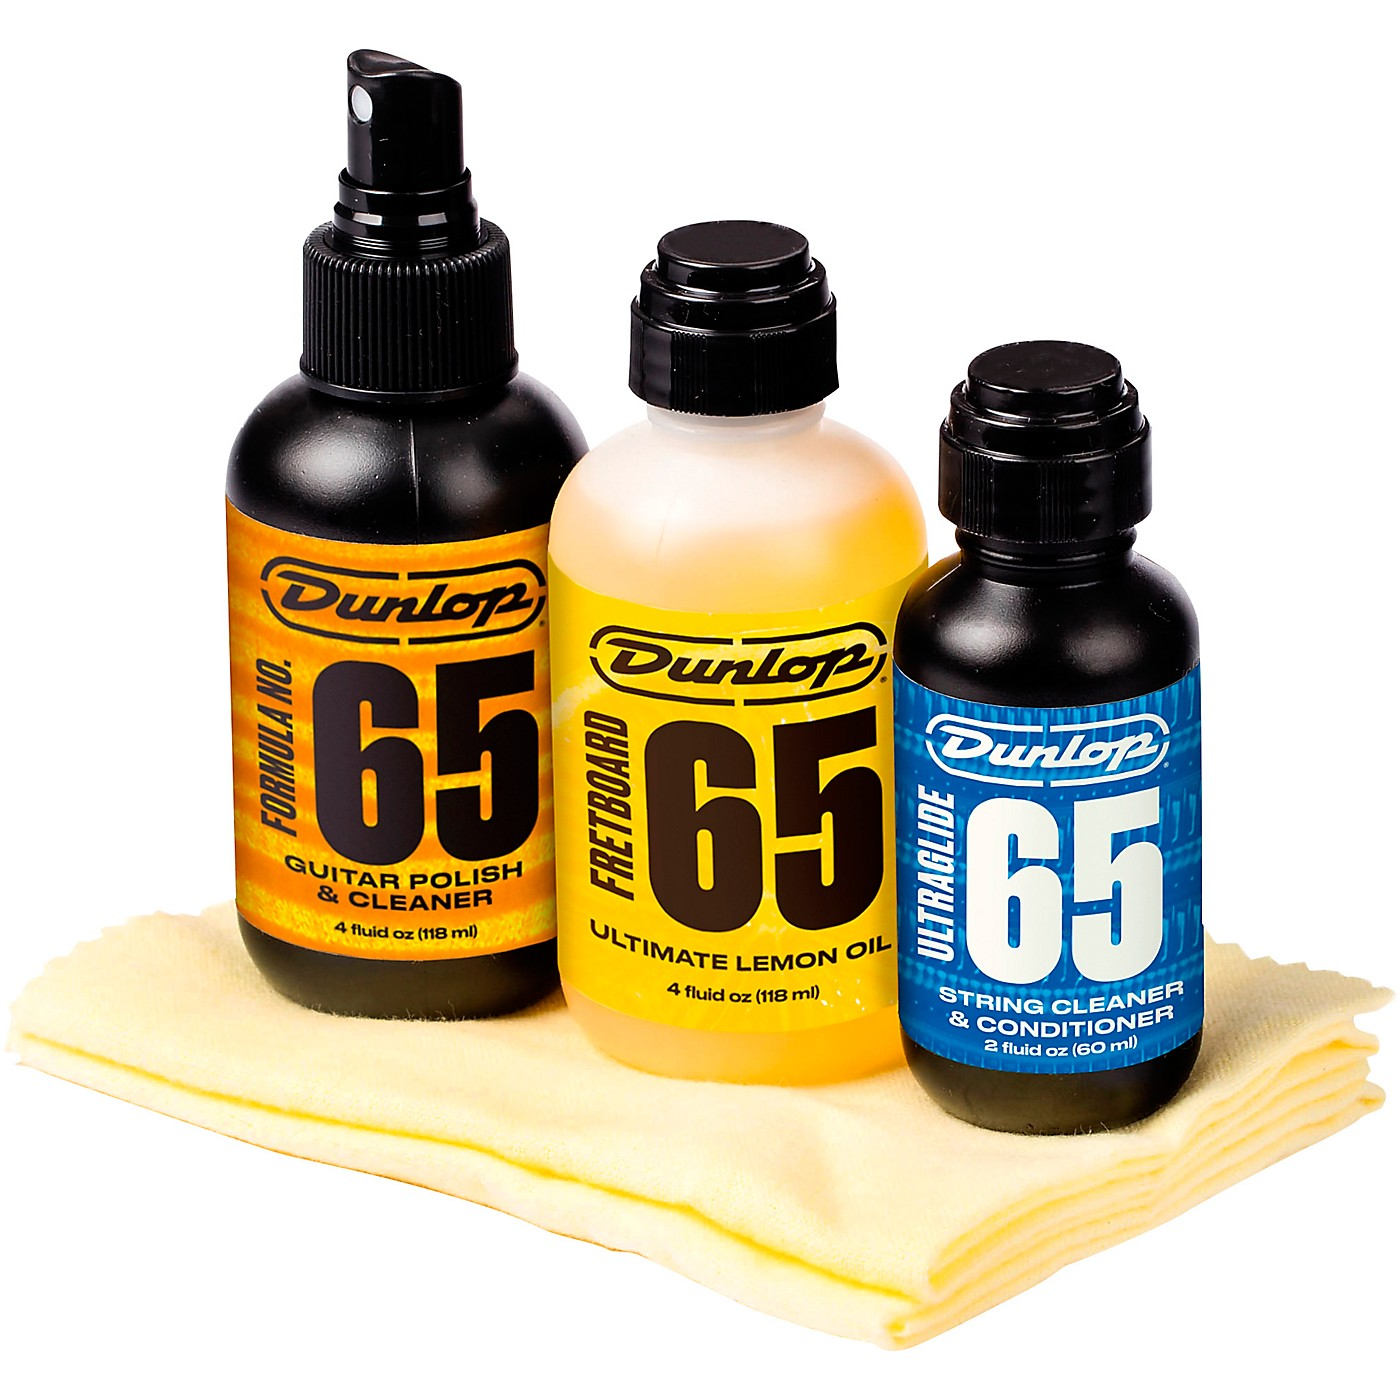 Dunlop Formula 65 Guitar Tech Kit thumbnail